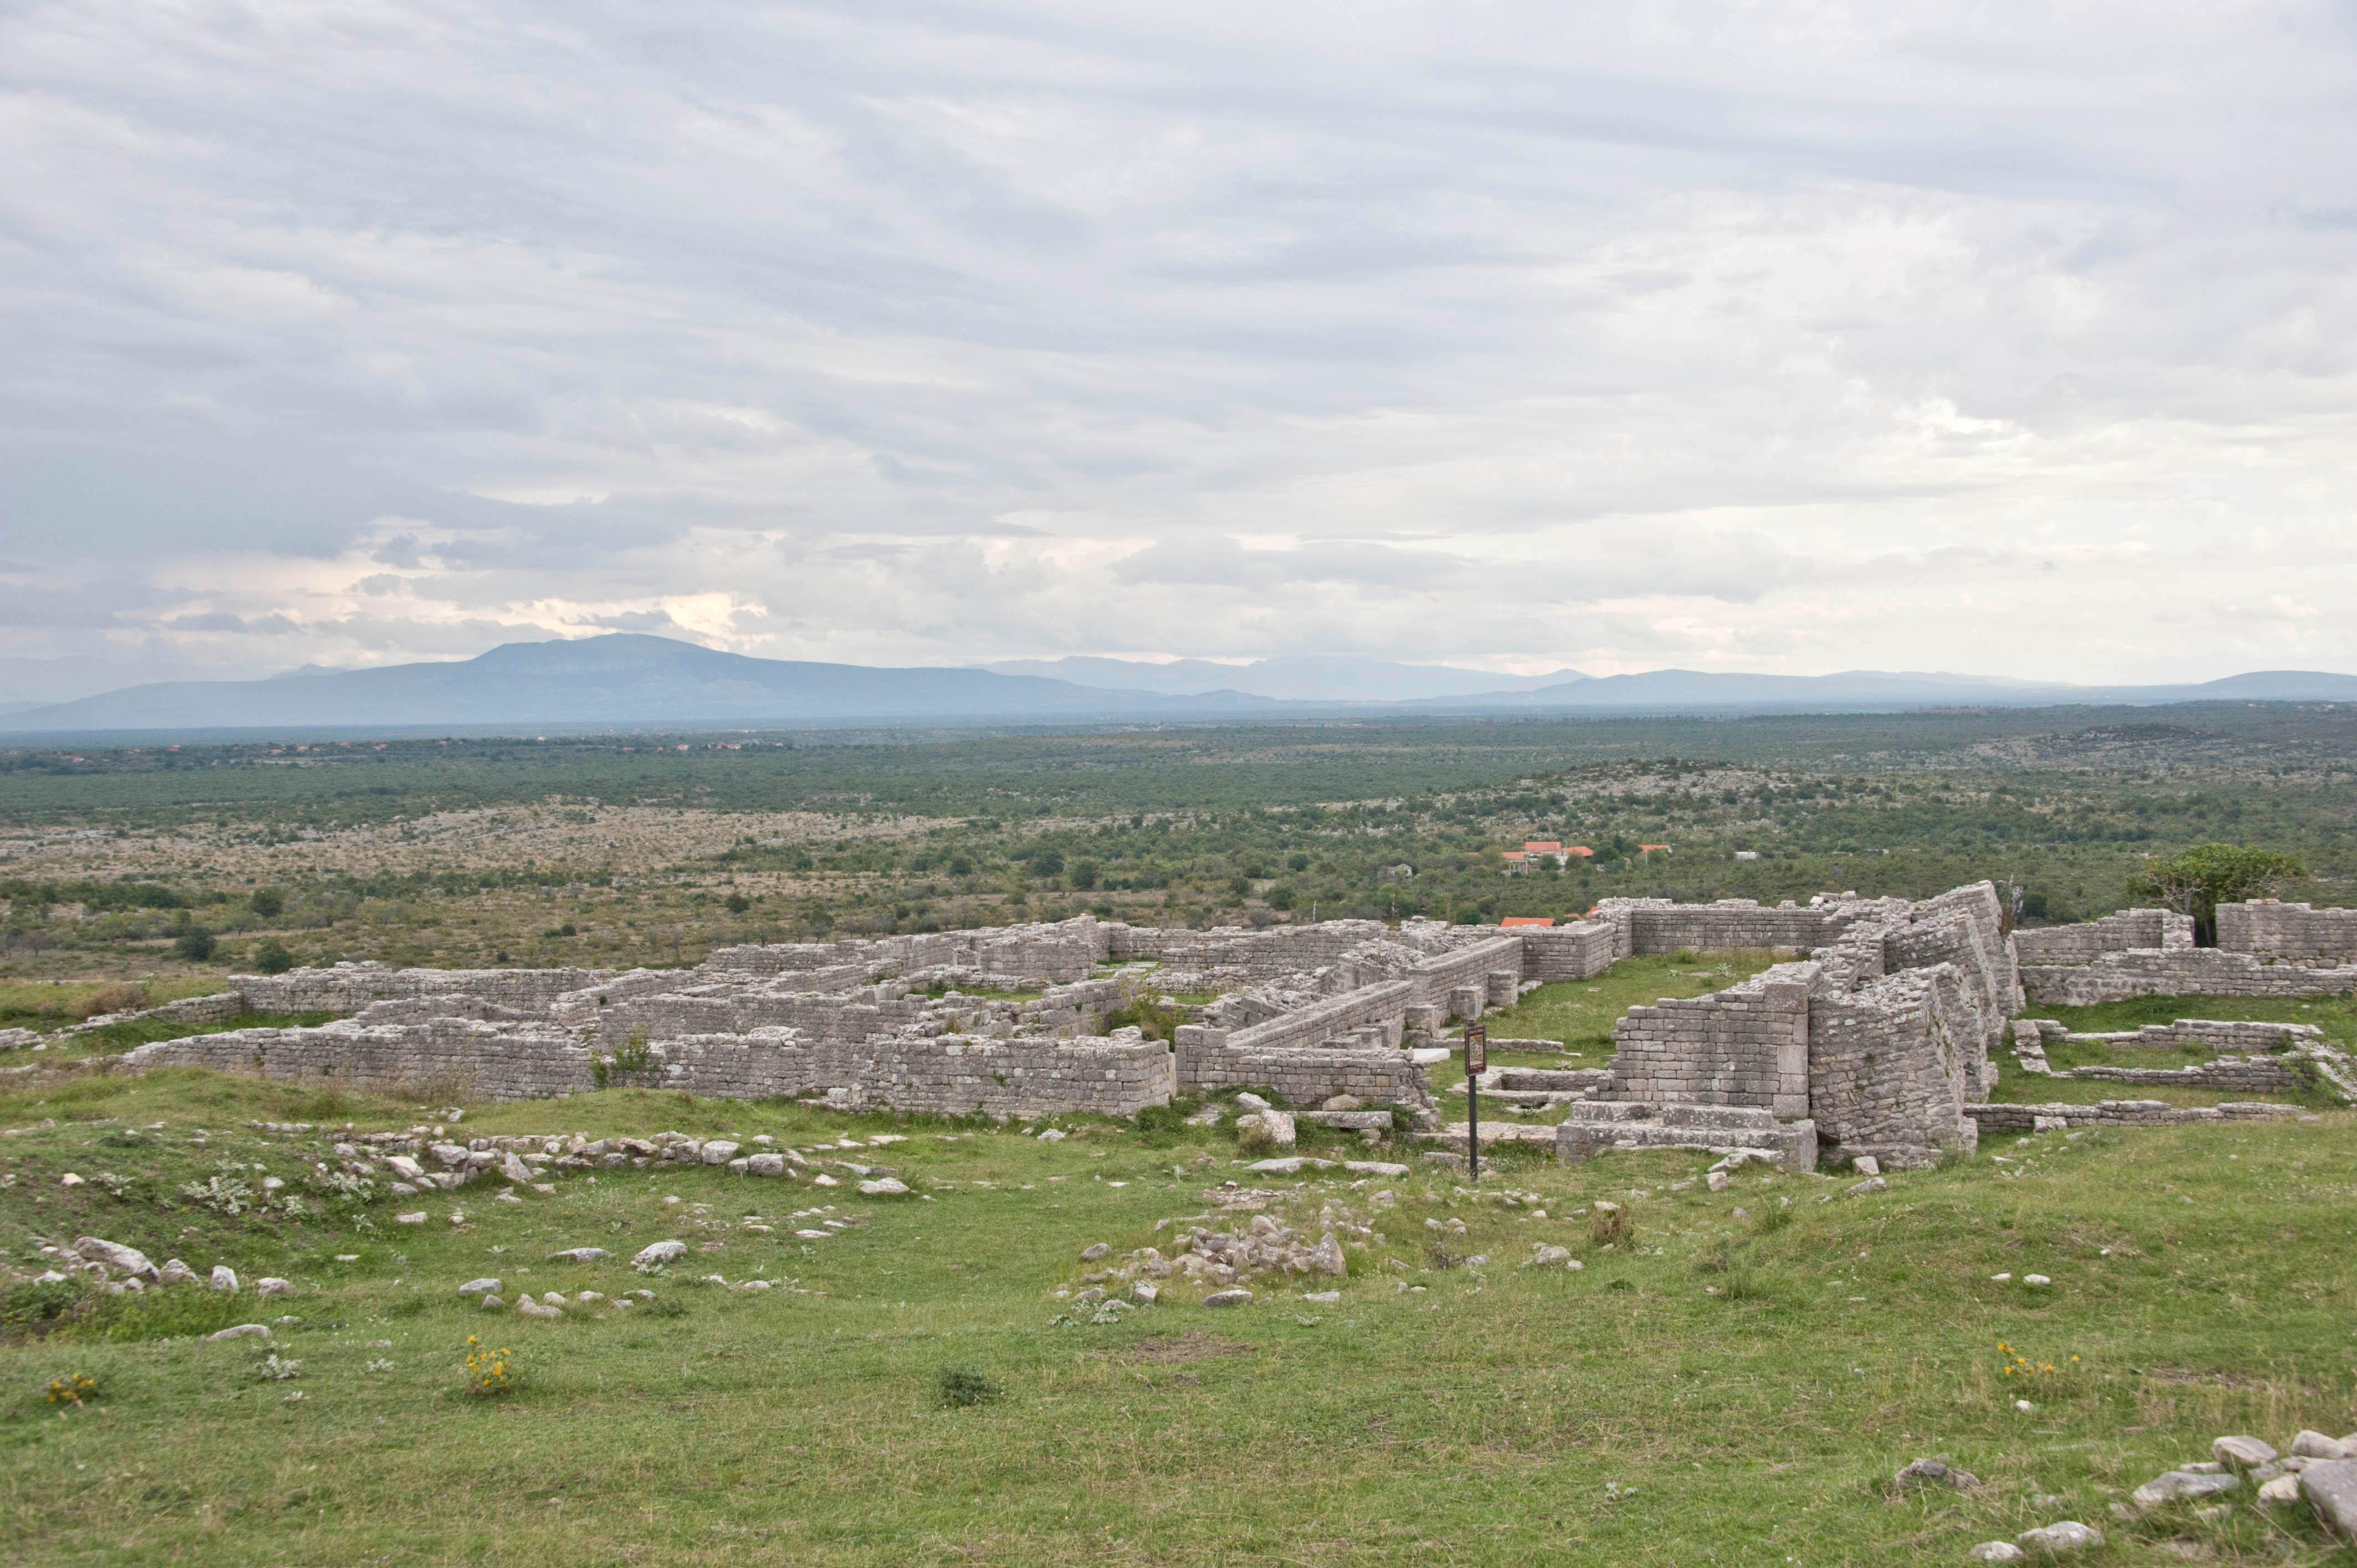 9549-Bribir-Parc national Krka (Dalmatie du Nord)